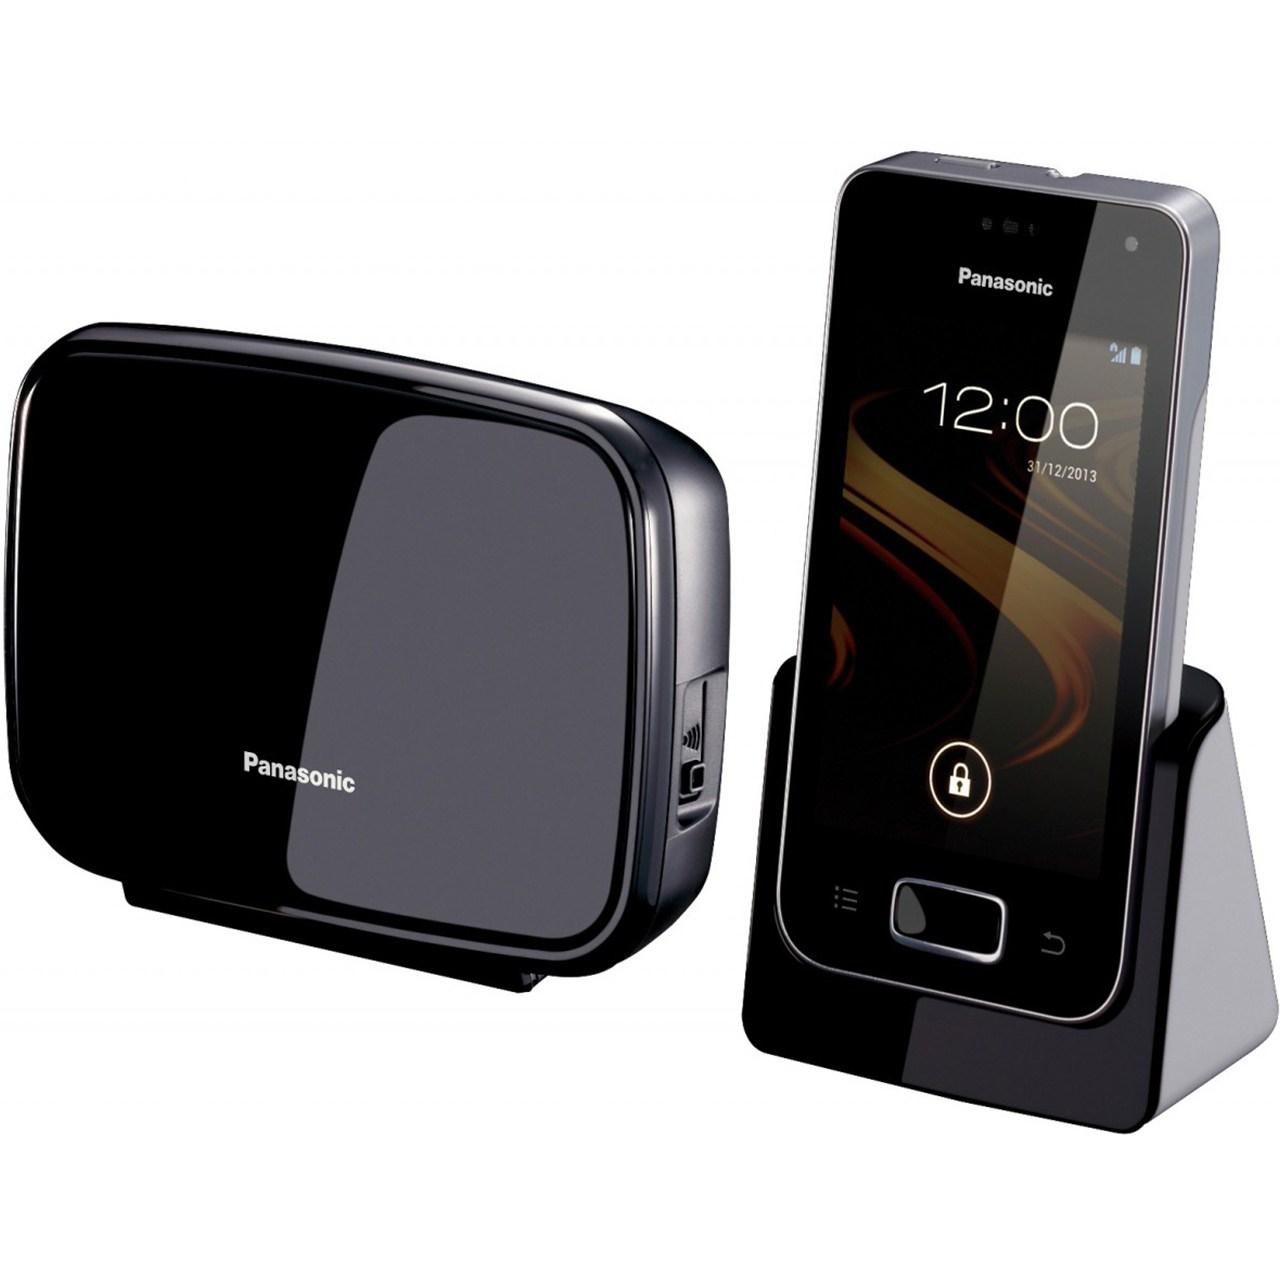 تلفن بیسیم پاناسونیک مدل KX-PRX120